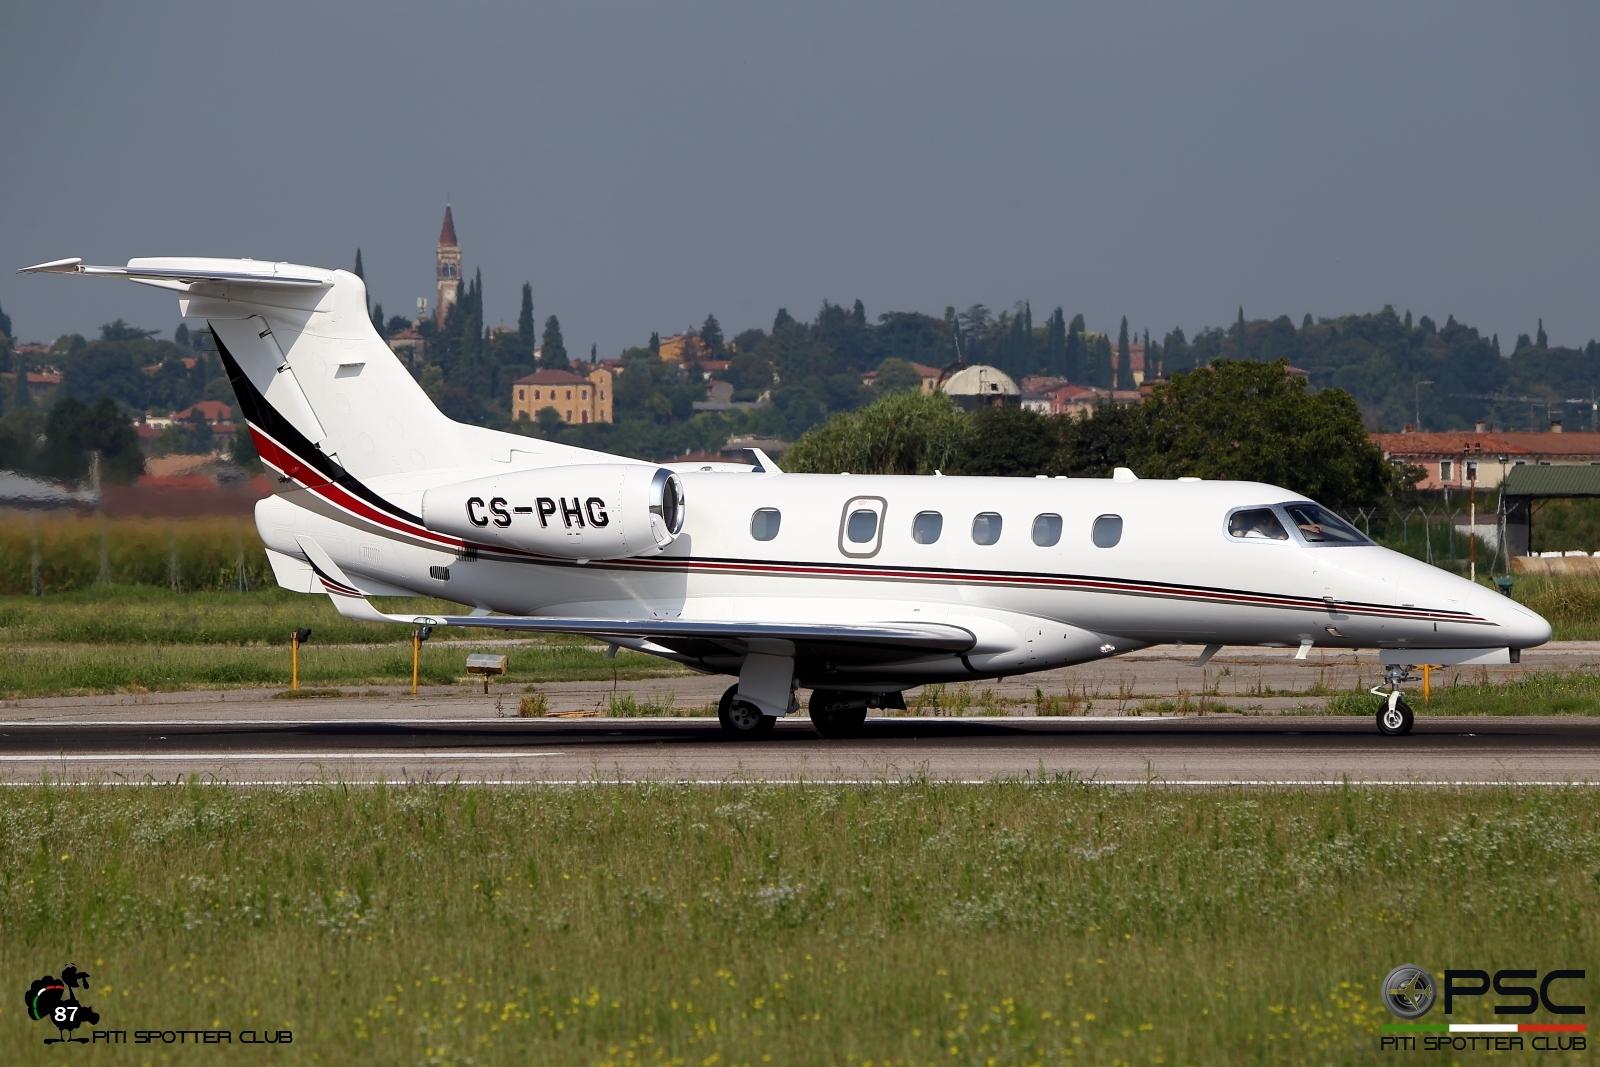 CS-PHG EMB505 50500264 NetJets Europe @ Aeroporto di Verona - 20/08/2016 © Piti Spotter Club Verona